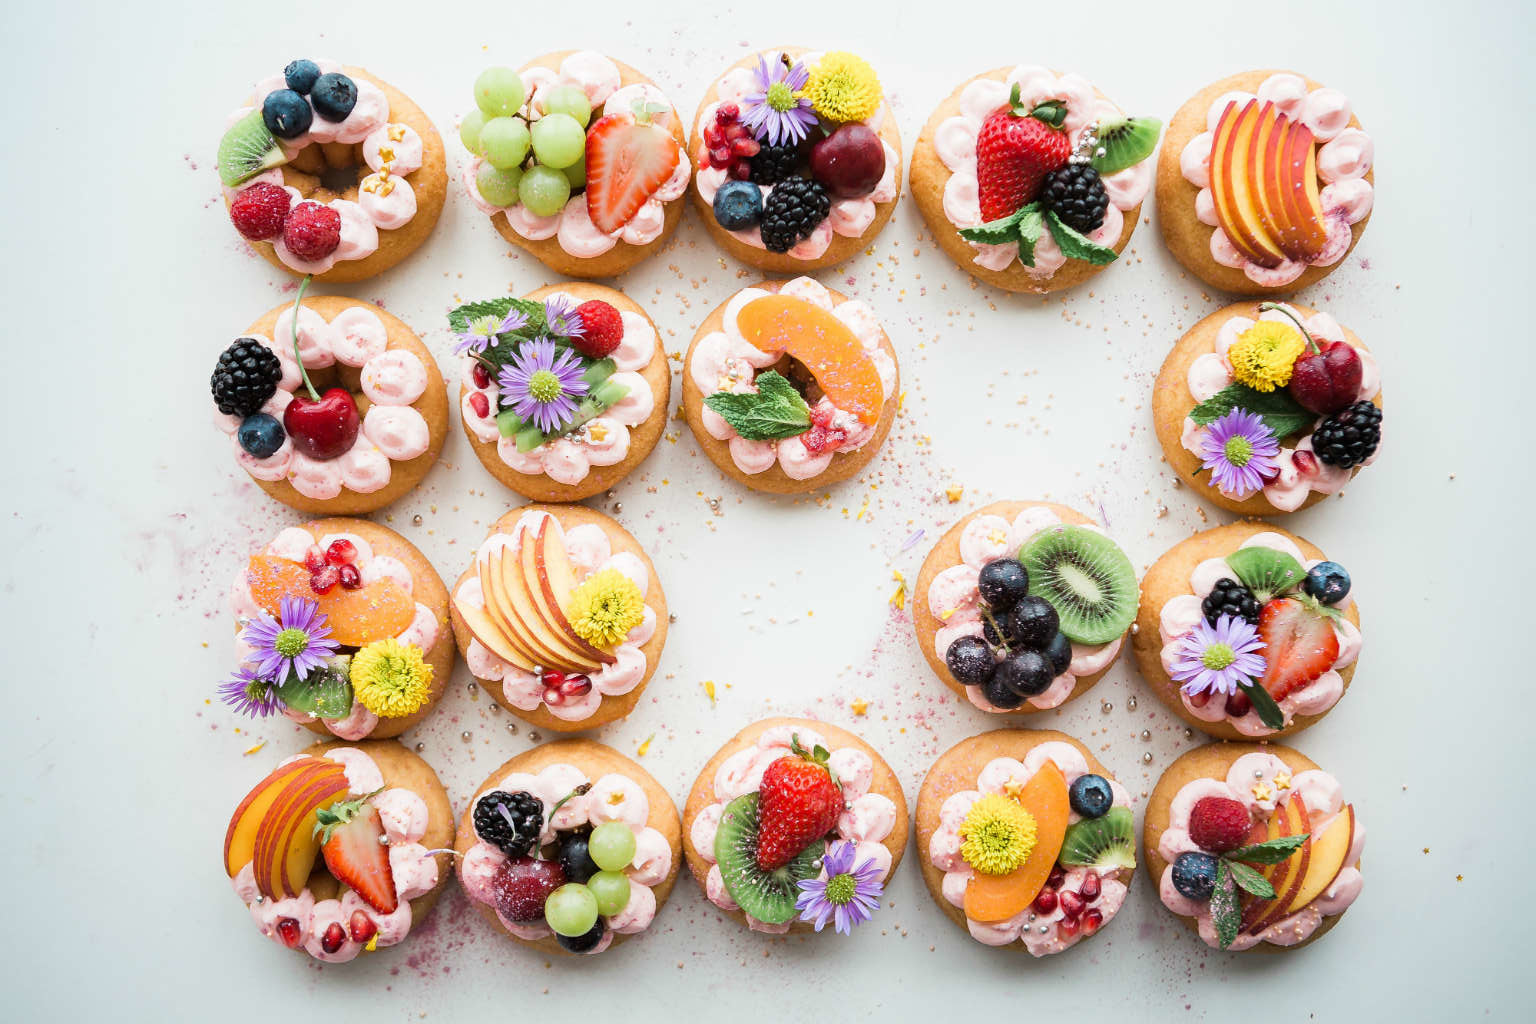 flores comestibles como usarlas